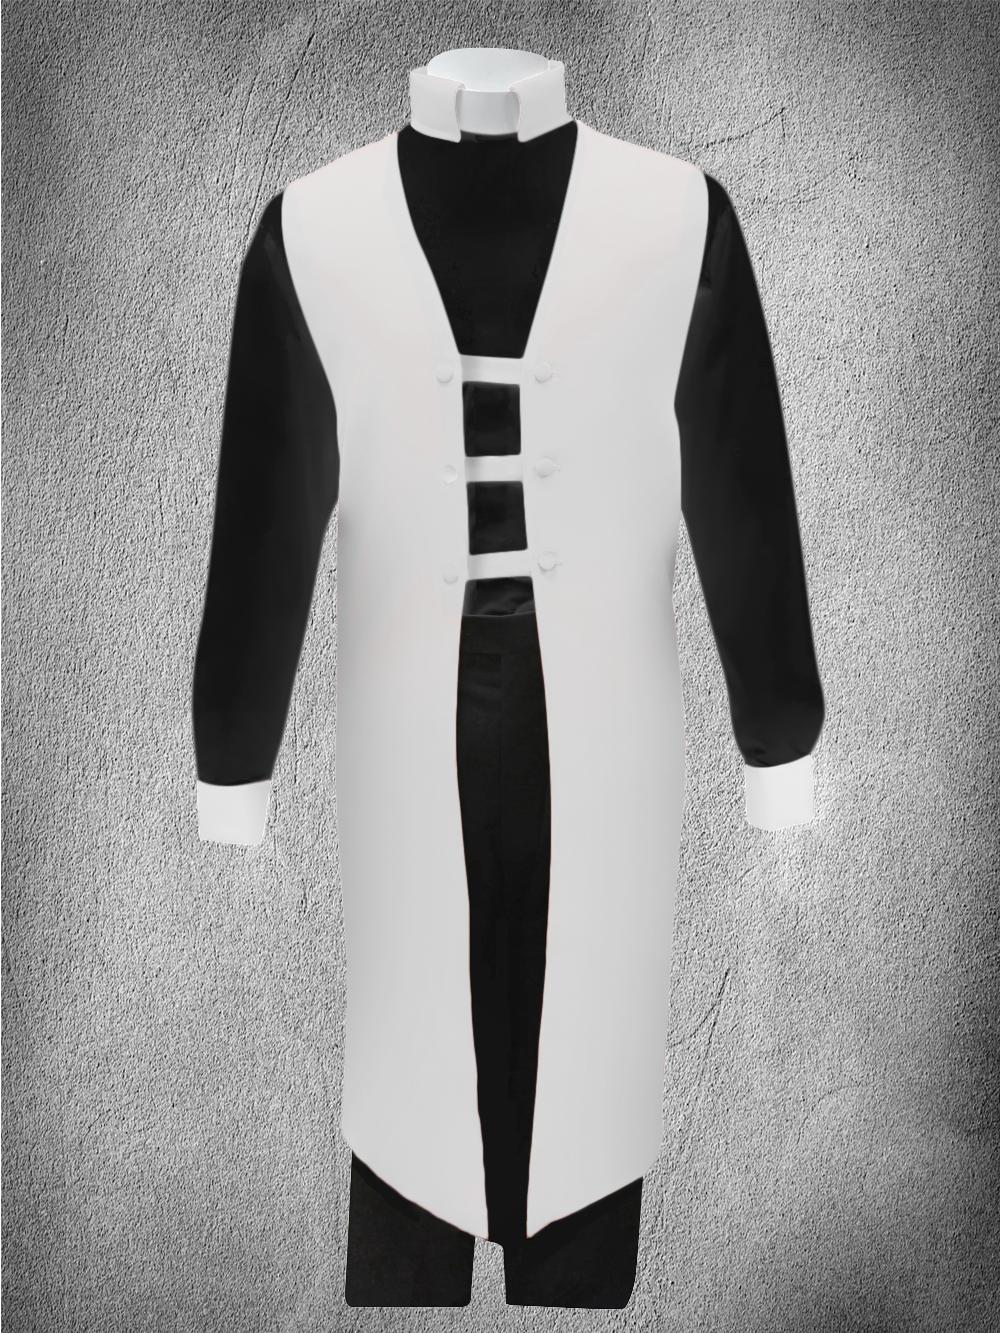 Contrast Ministerial Vesture Set White/Black-White